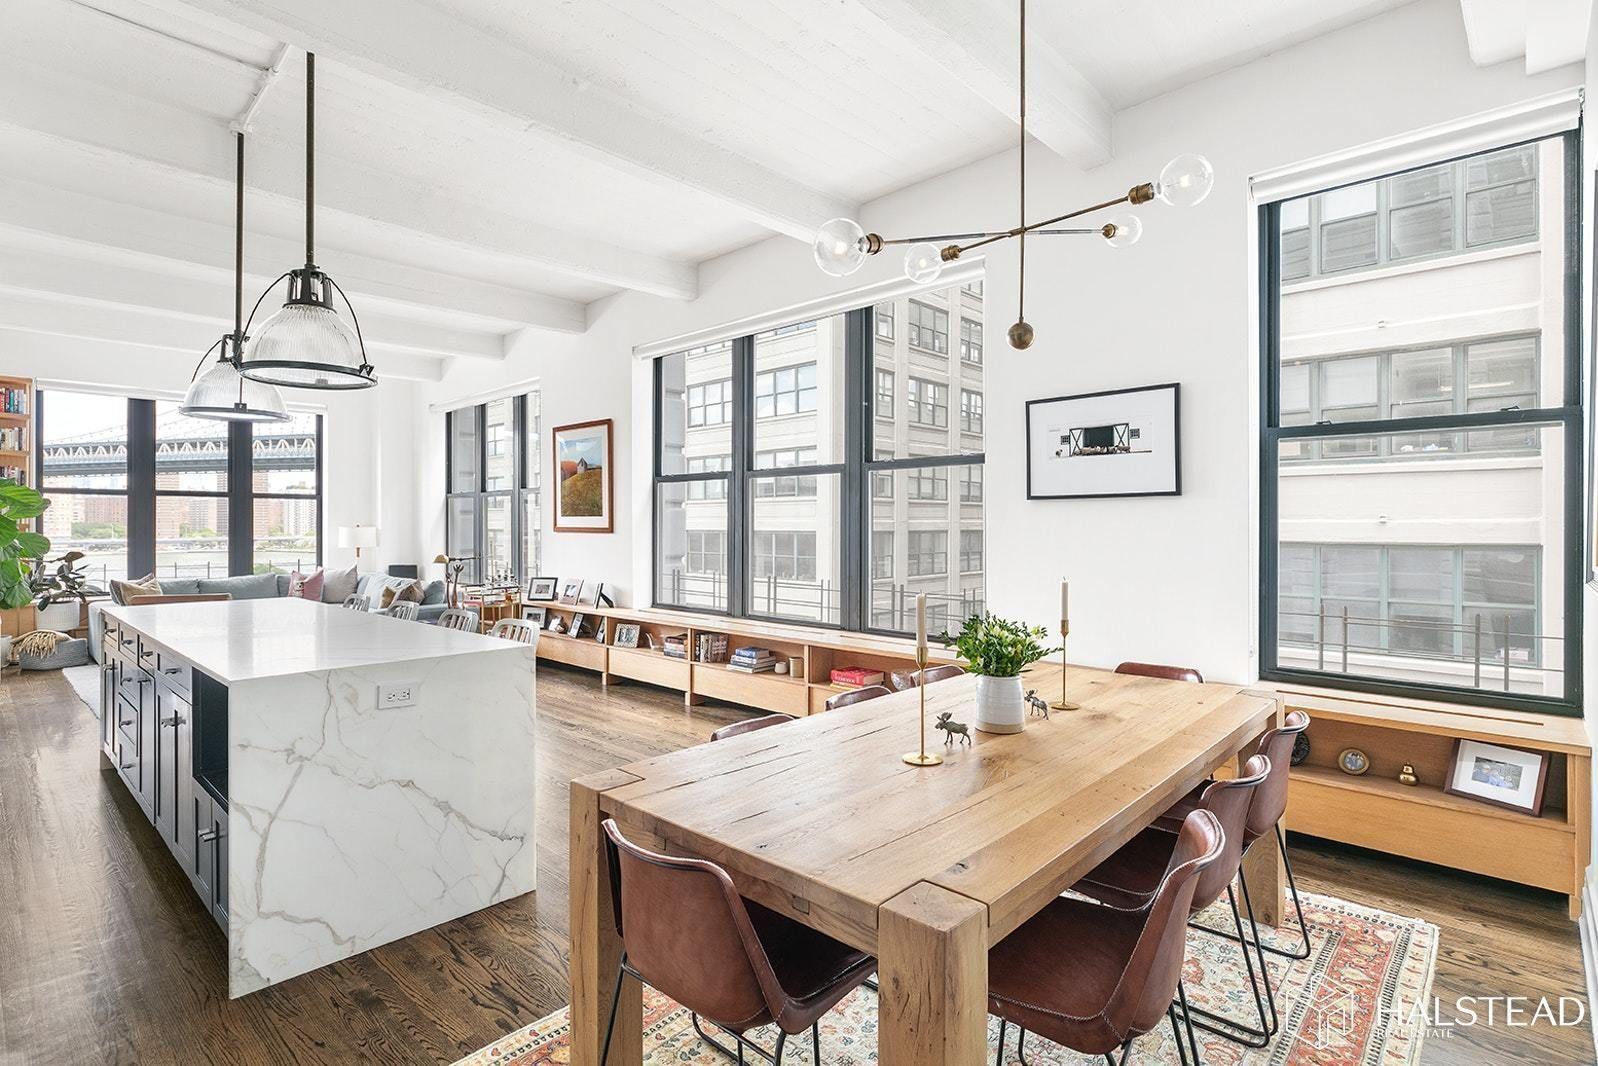 Apartment for sale at 30 Main Street, Apt 6B